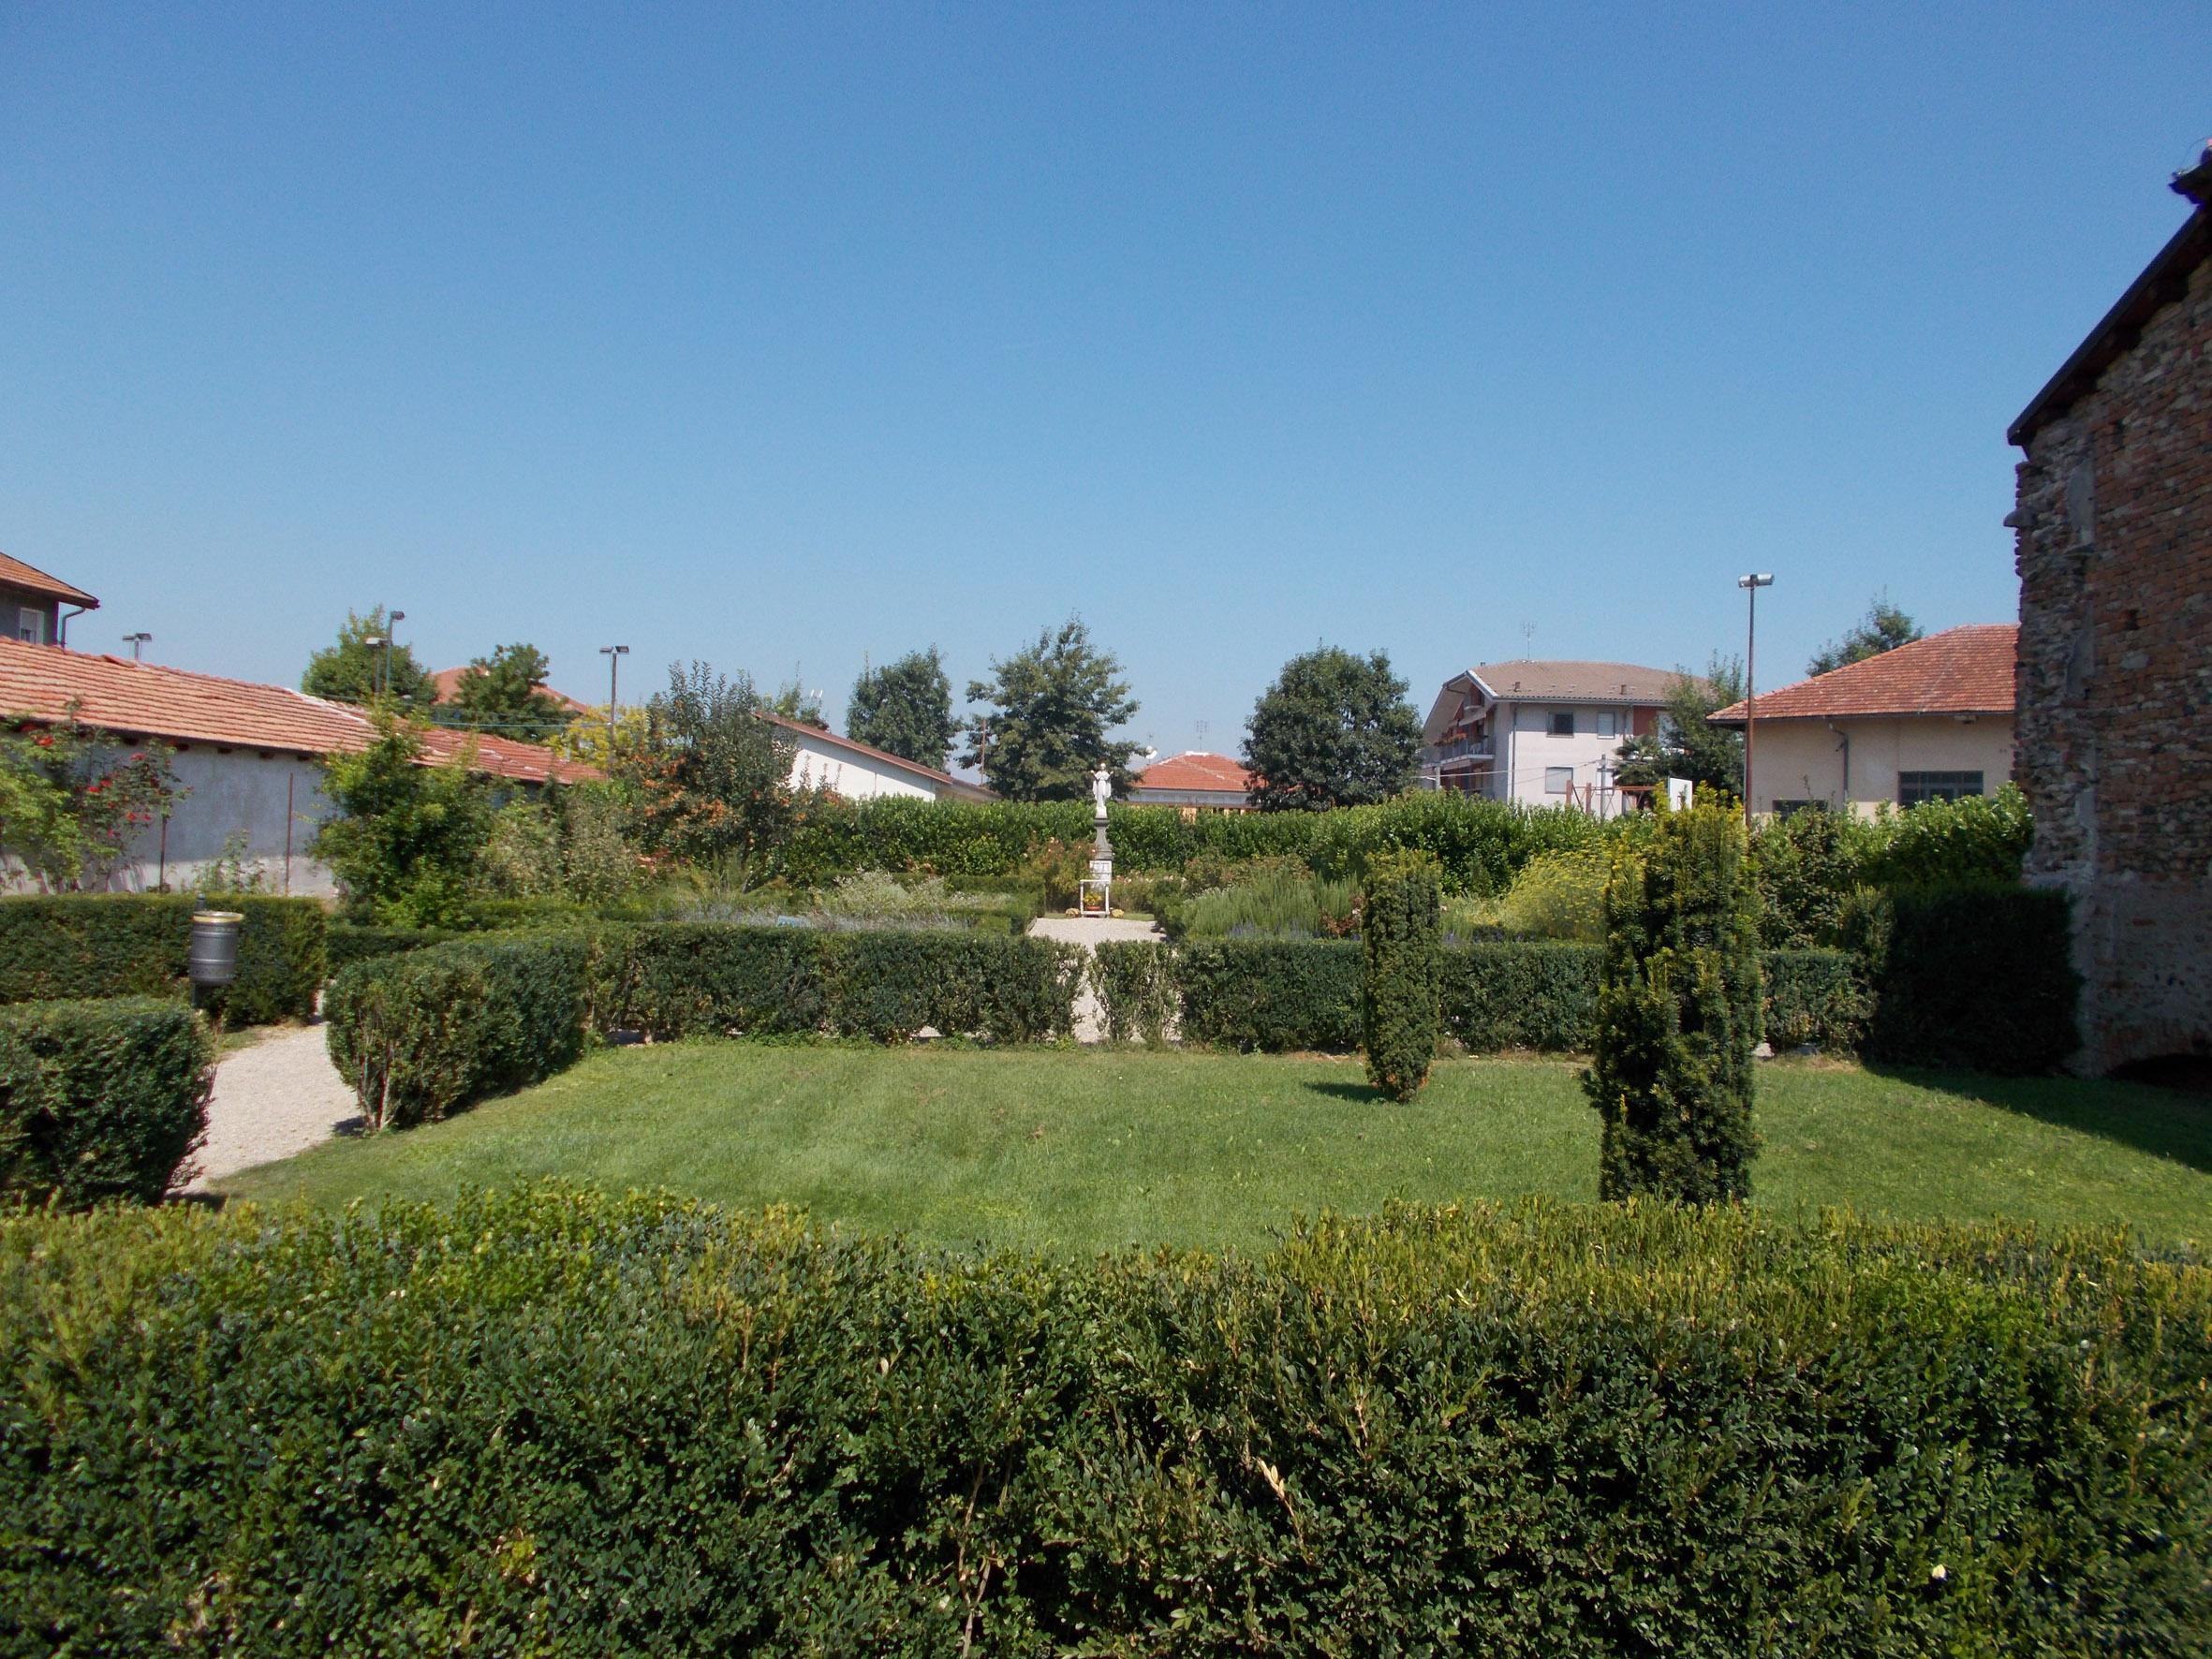 giardino_bassa2